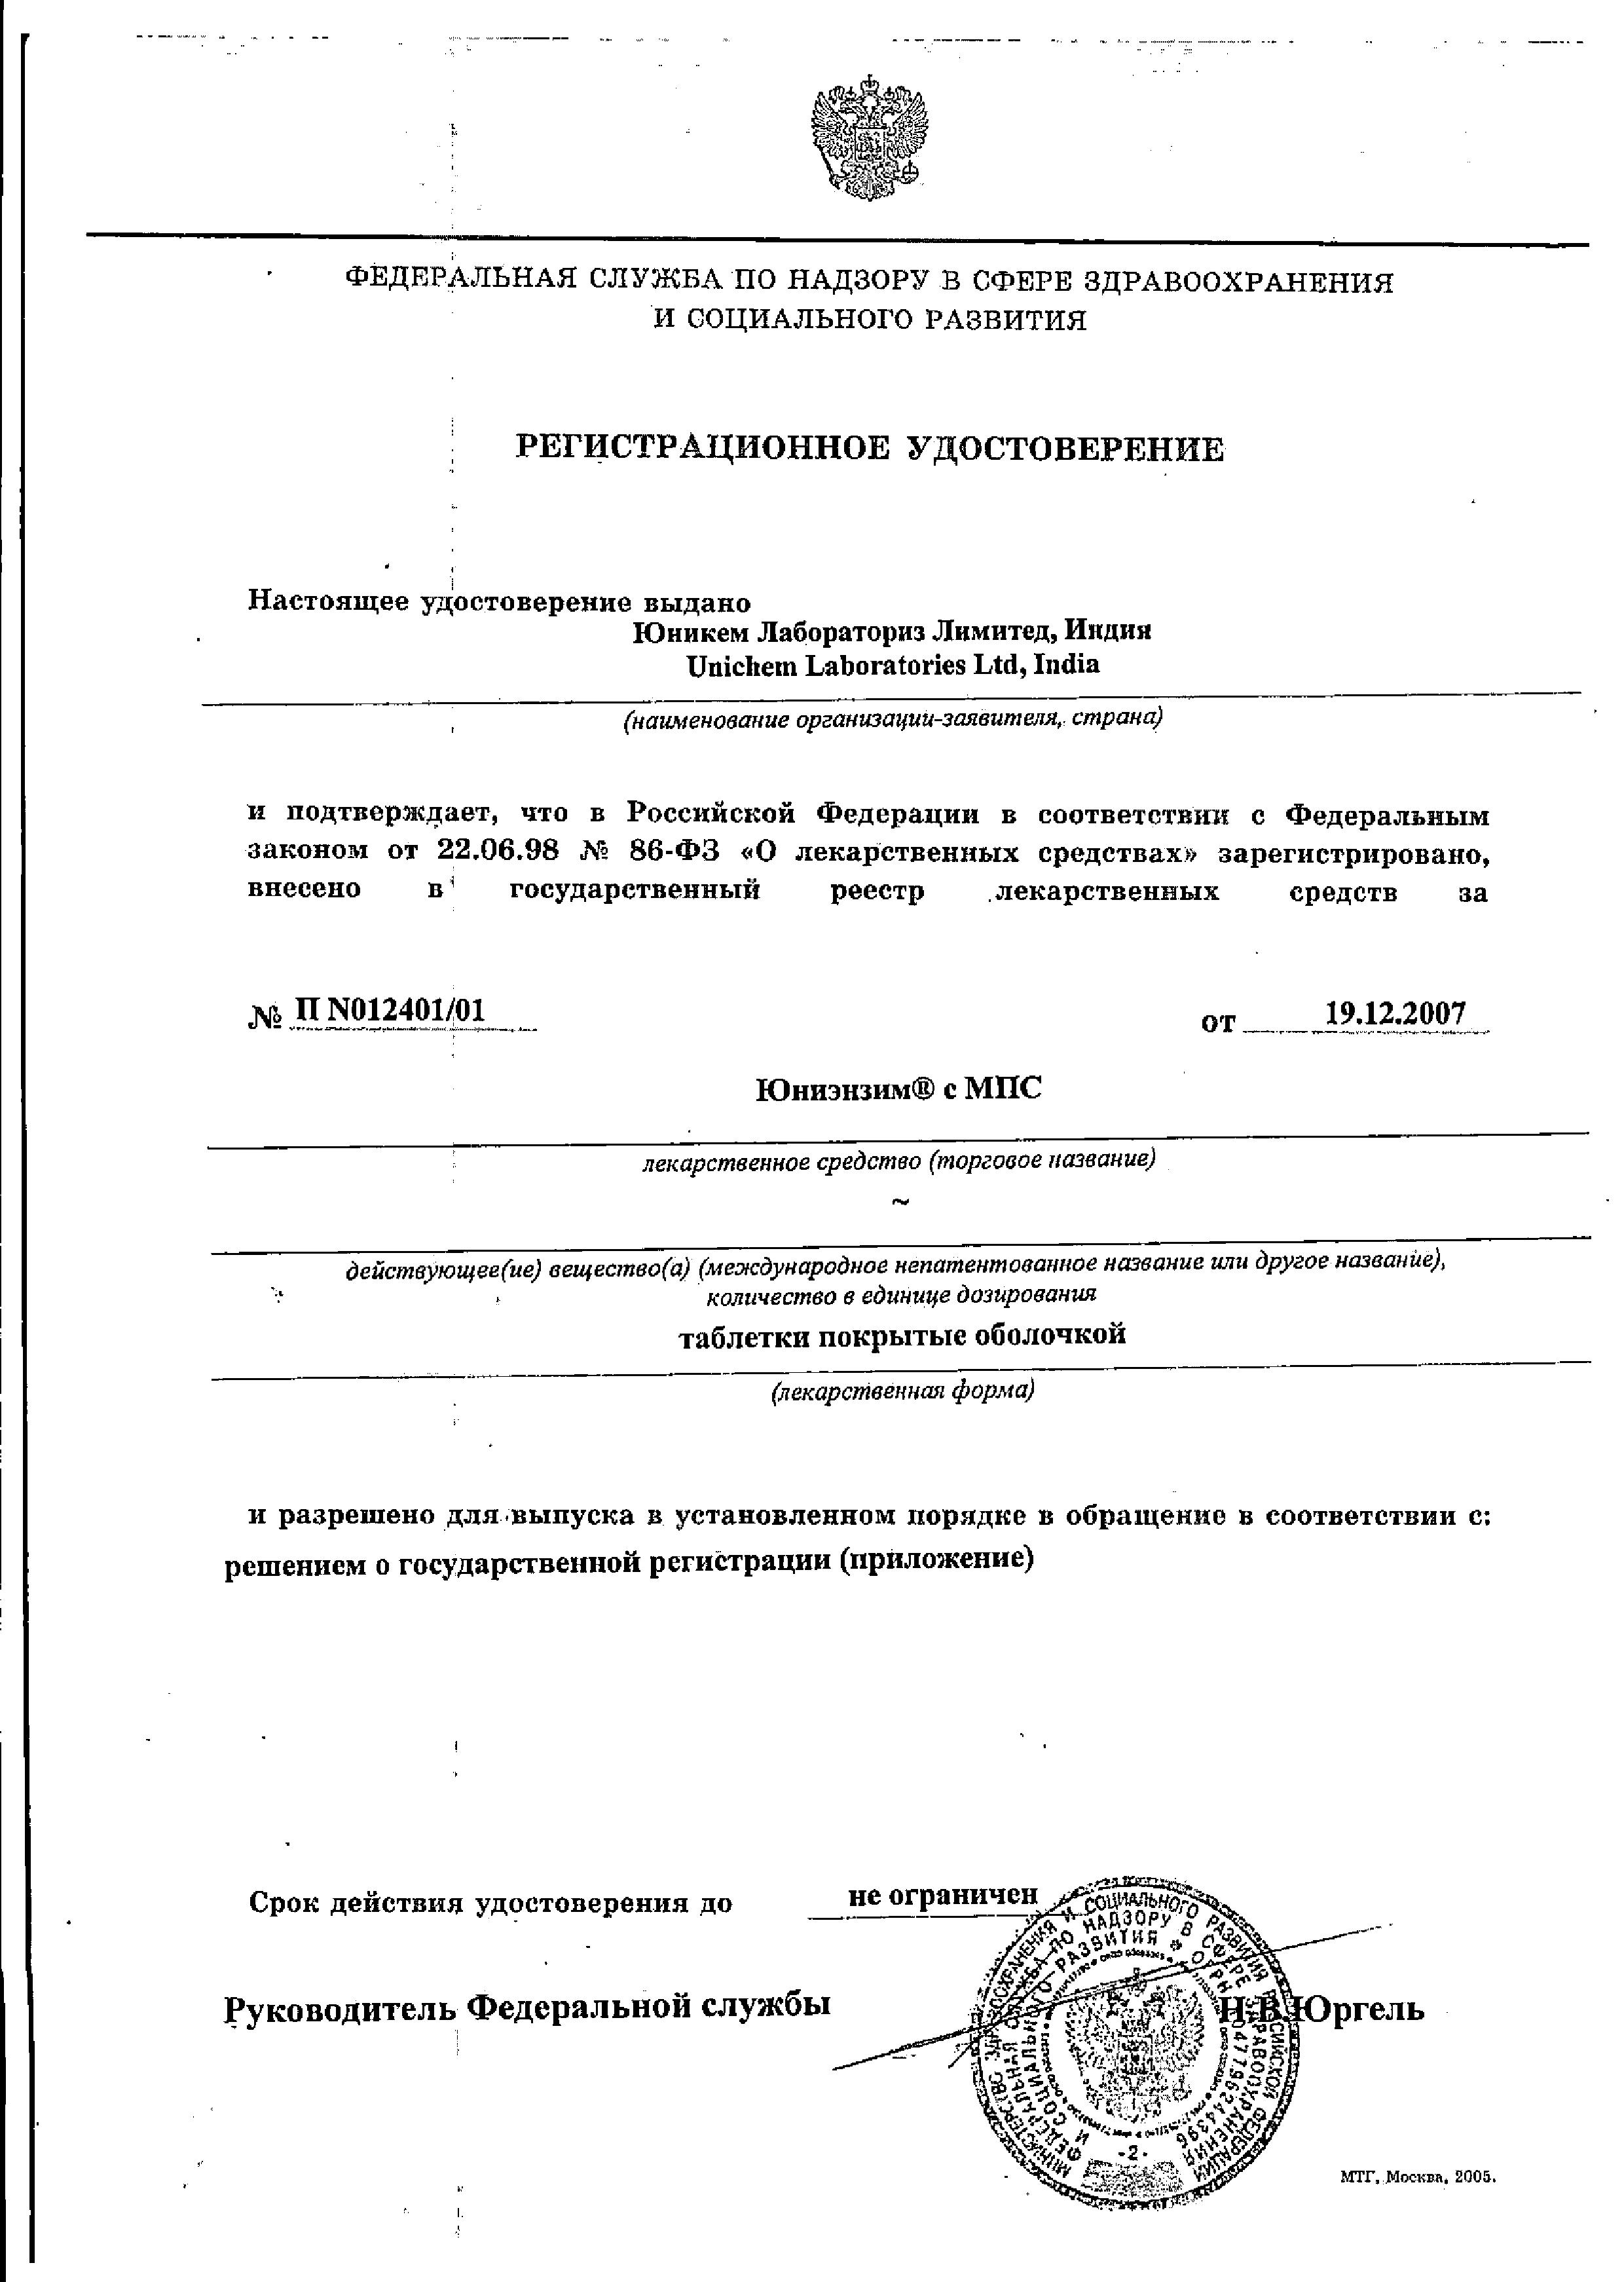 Юниэнзим с МПС сертификат